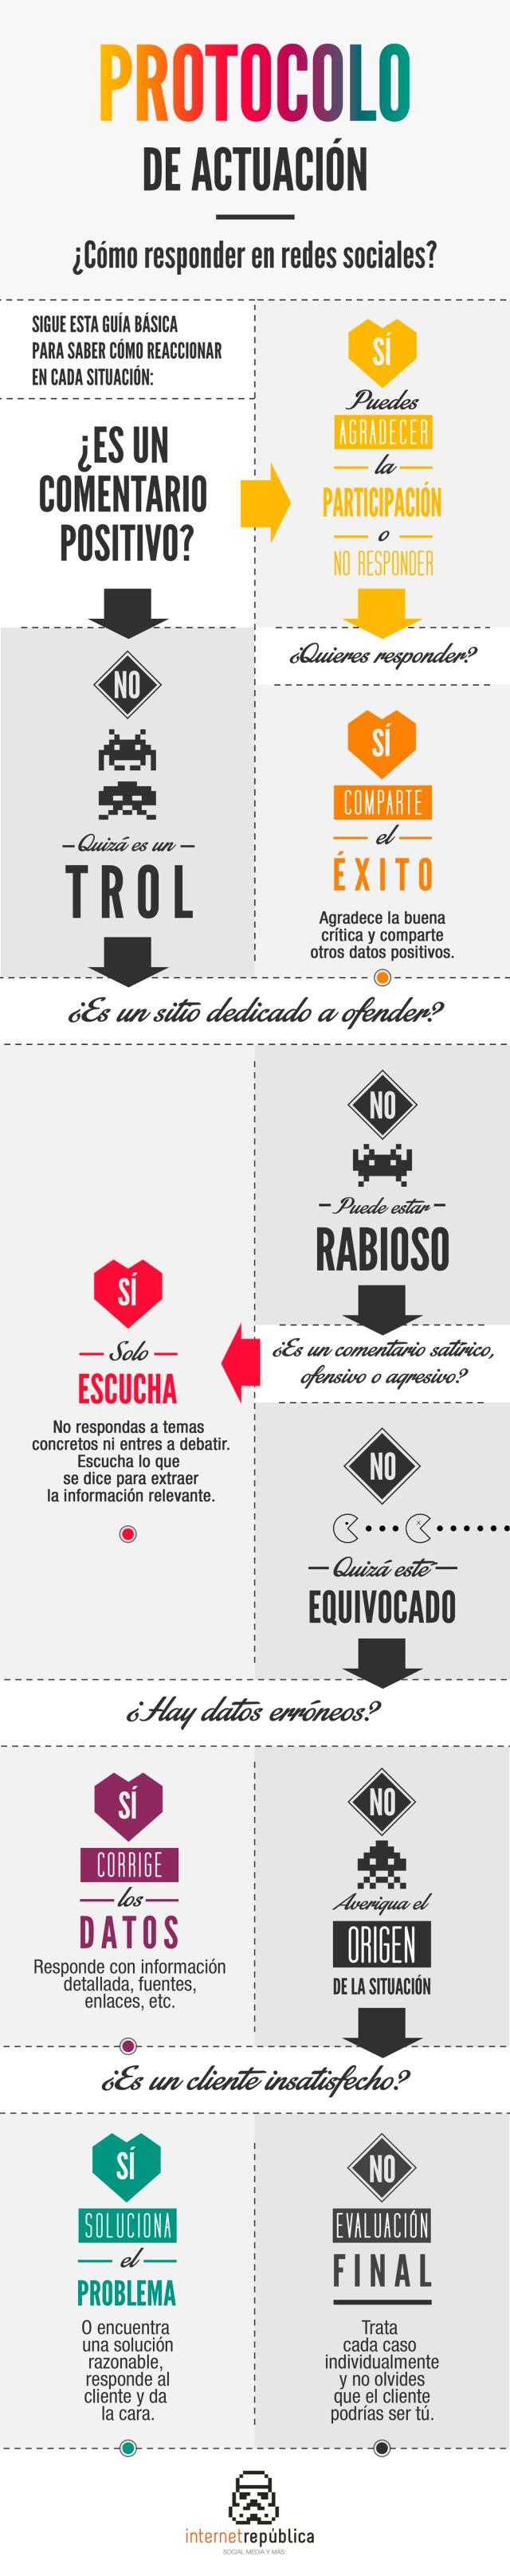 Adictos a las Redes Sociales #infografia #infographic #health #socialmedia